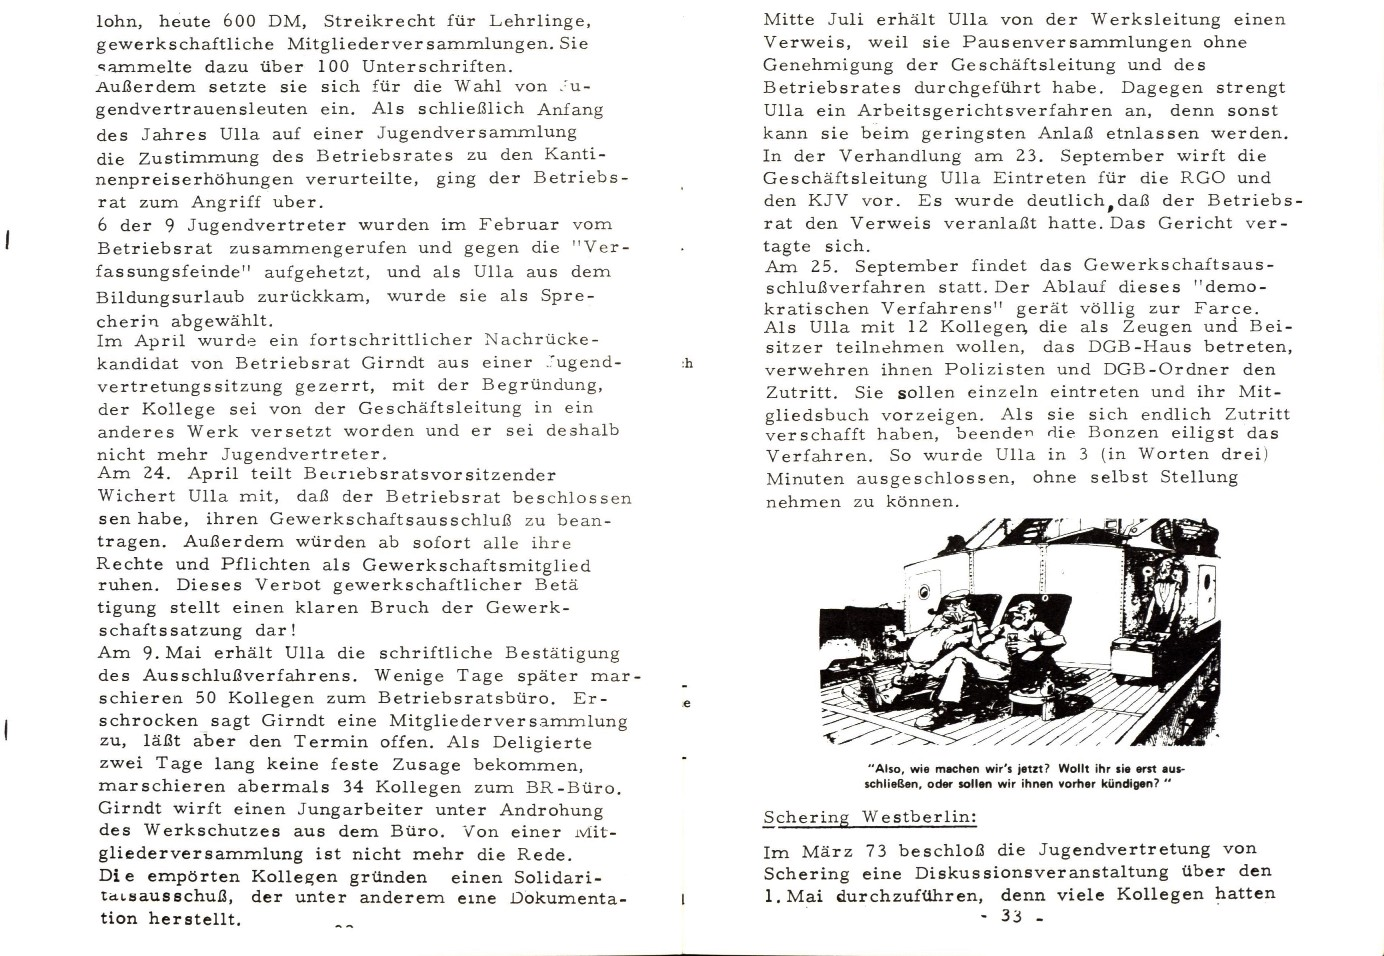 KJV_1973_NK_Arbeiterjugend_18